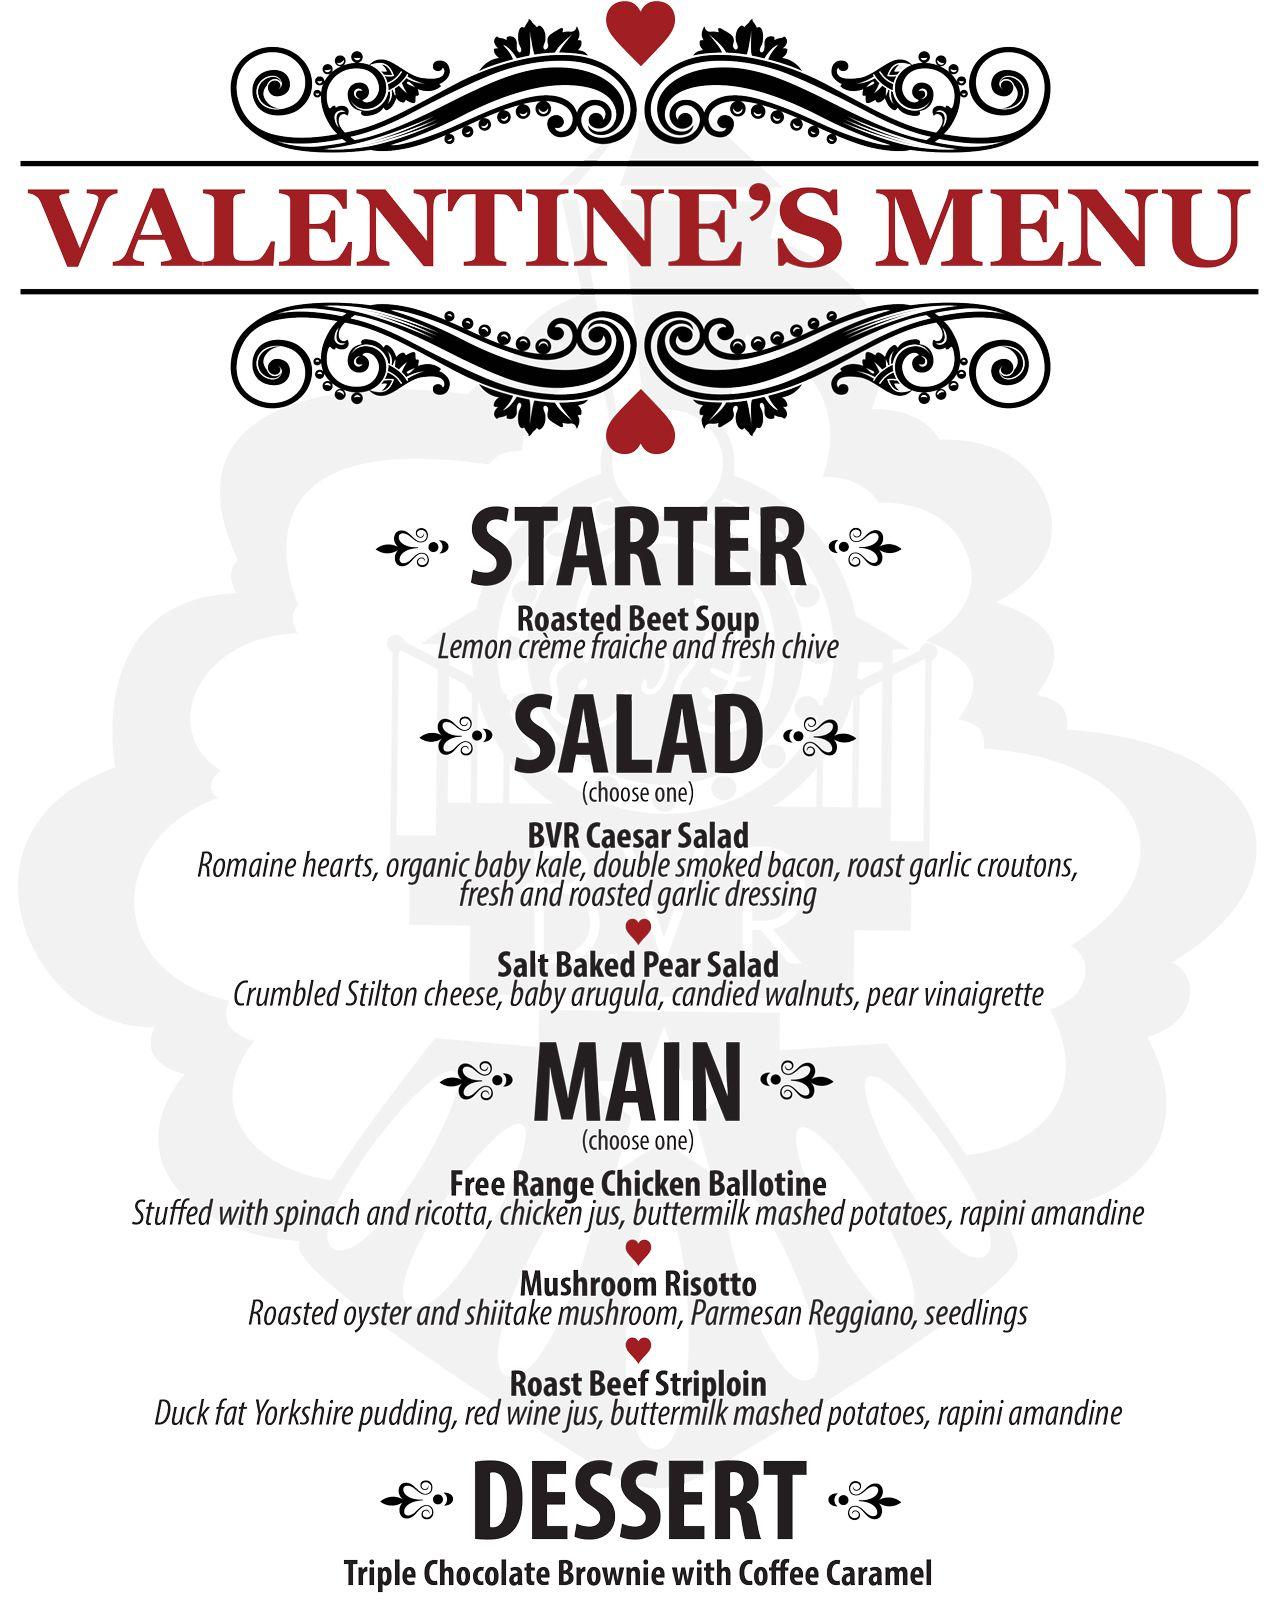 Valentine menu advertising pinterest menu for Romantic valentine dinner menu ideas